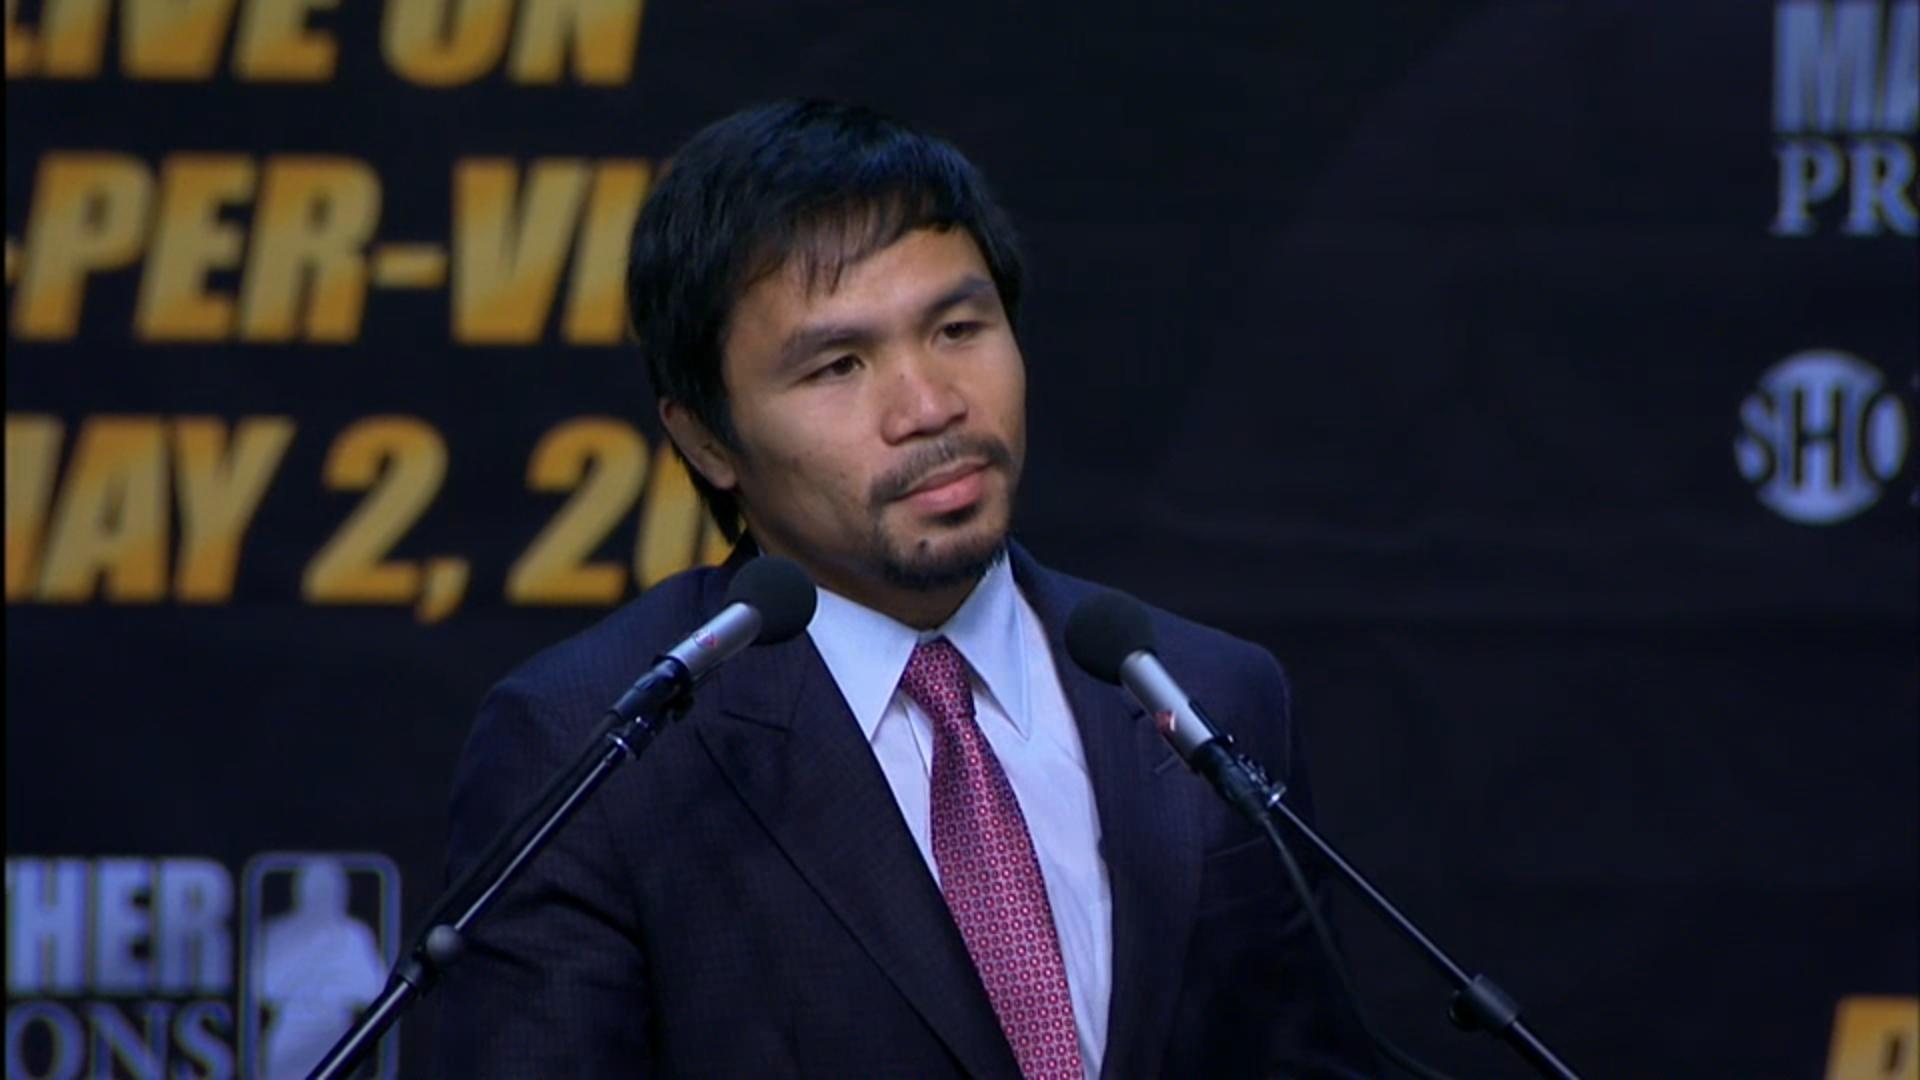 Manny Pacquiao antes de la pelea - 1920x1080